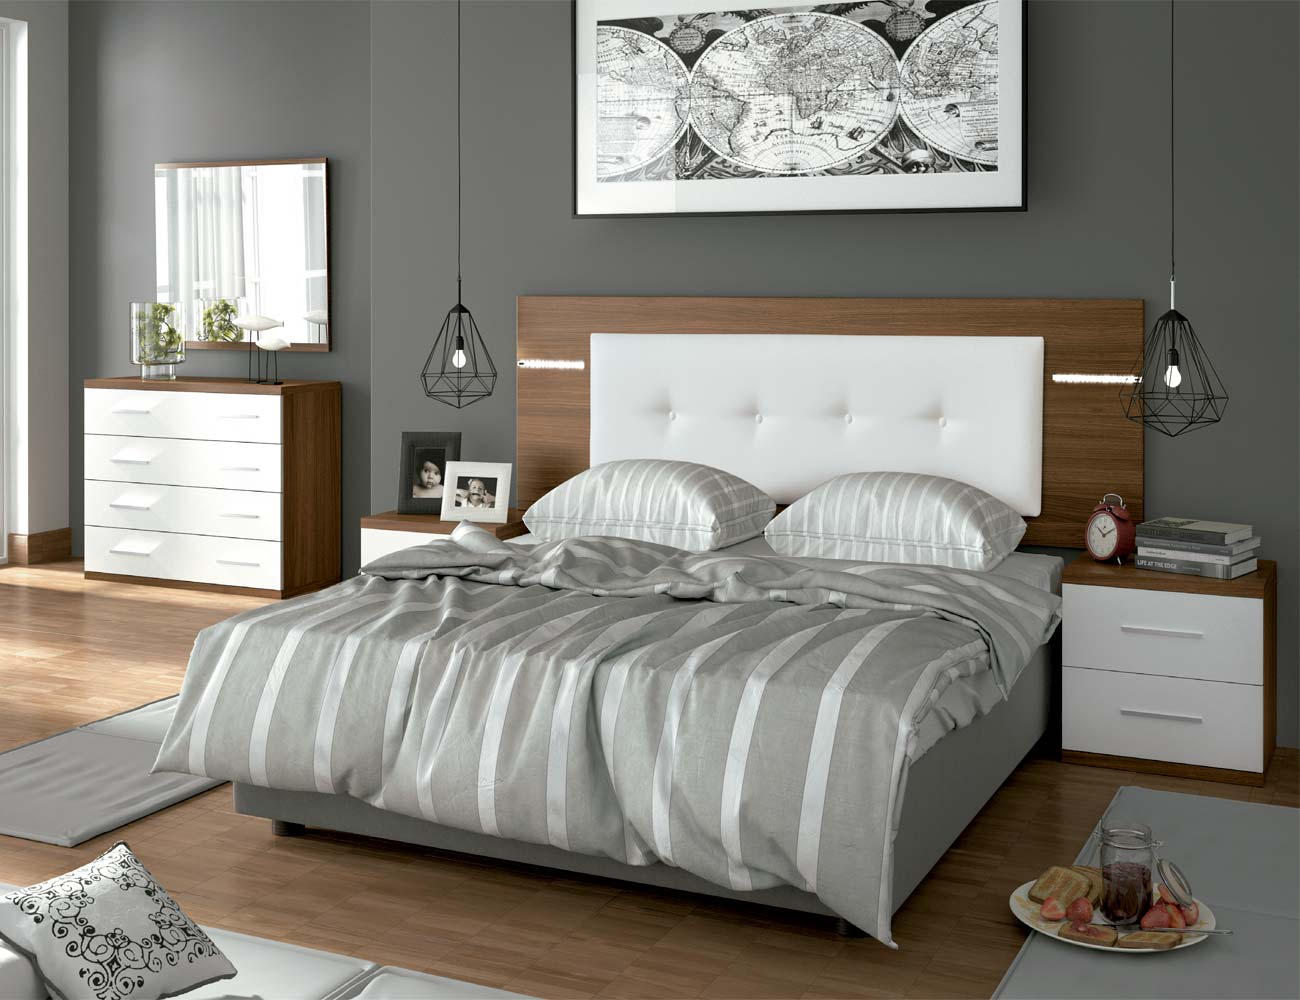 Dormitorio matrimonio moderno 15 nogal blanco